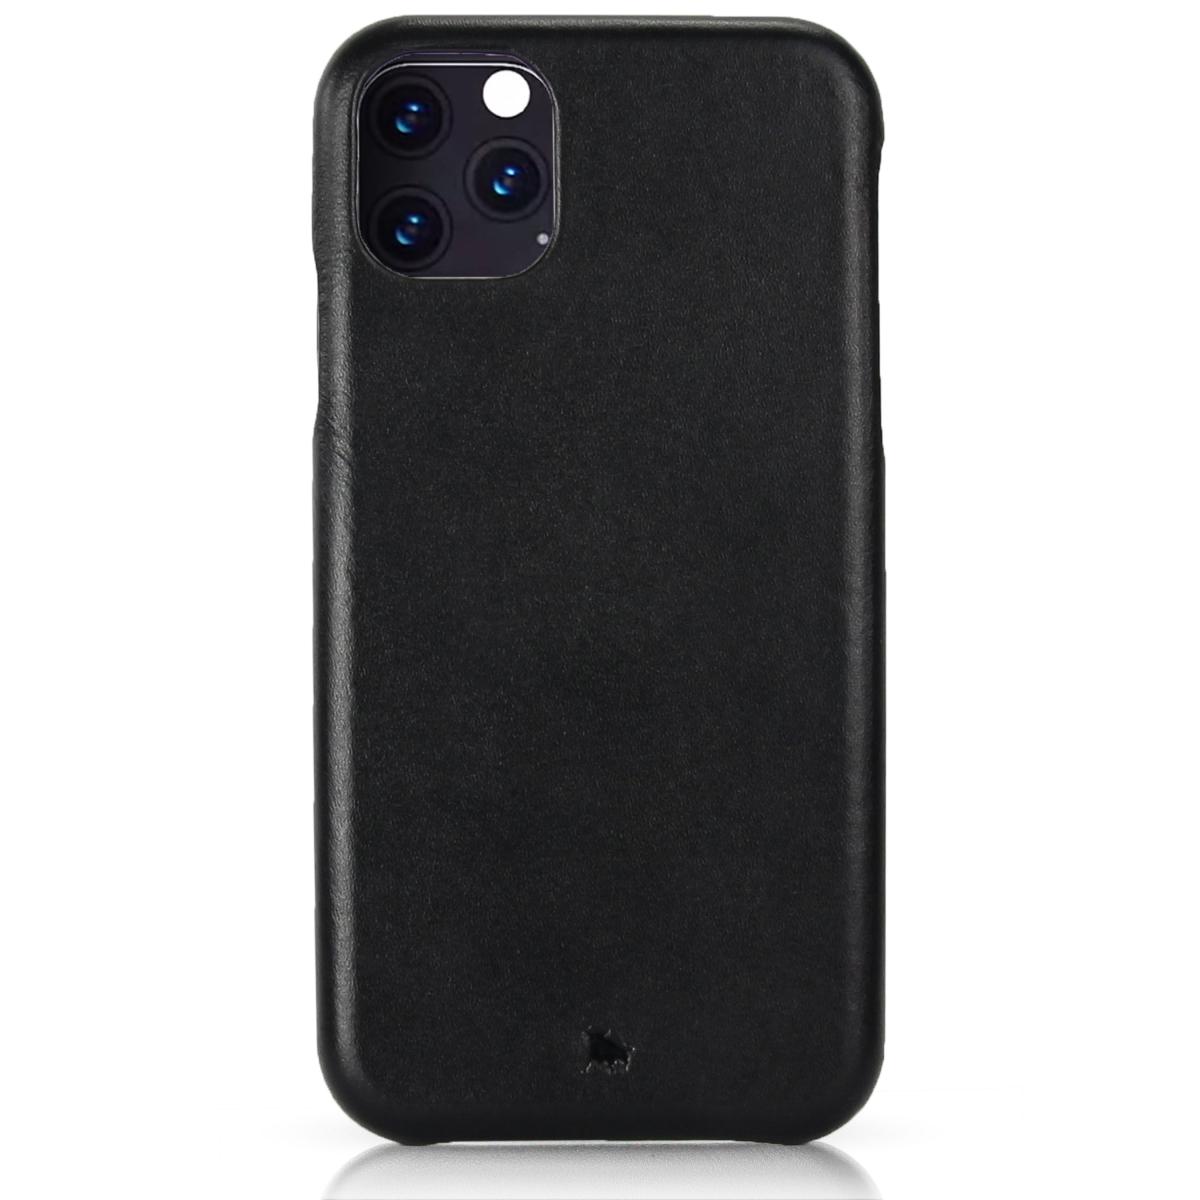 iPhone 11 XI Pro Max Case Leather - Minimalistic Design